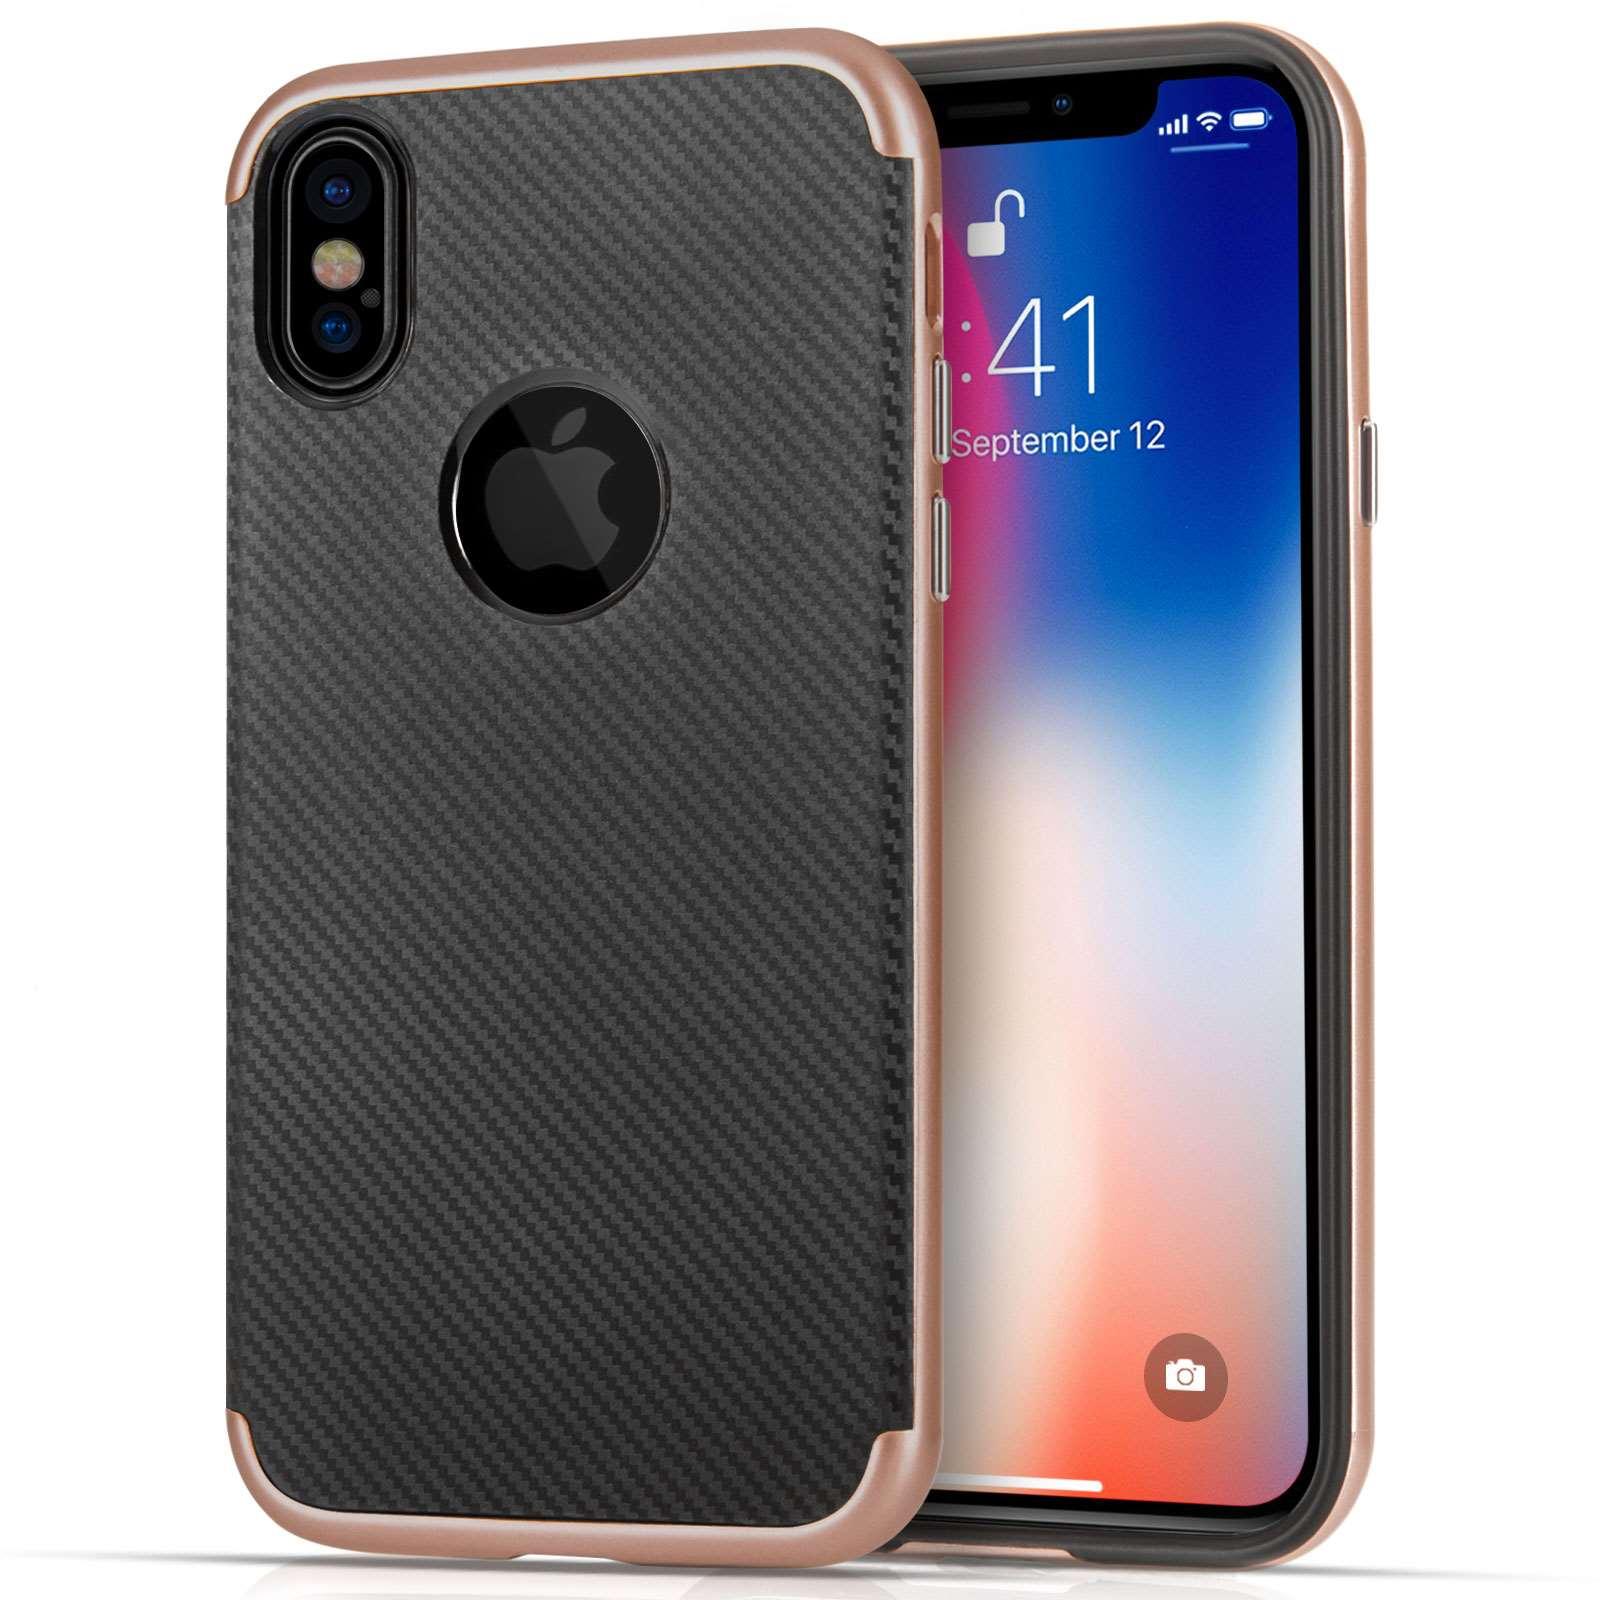 Centopi Θήκη Carbon Fibre iPhone X / XS - Black / Rose Gold (CEN-APP-124)